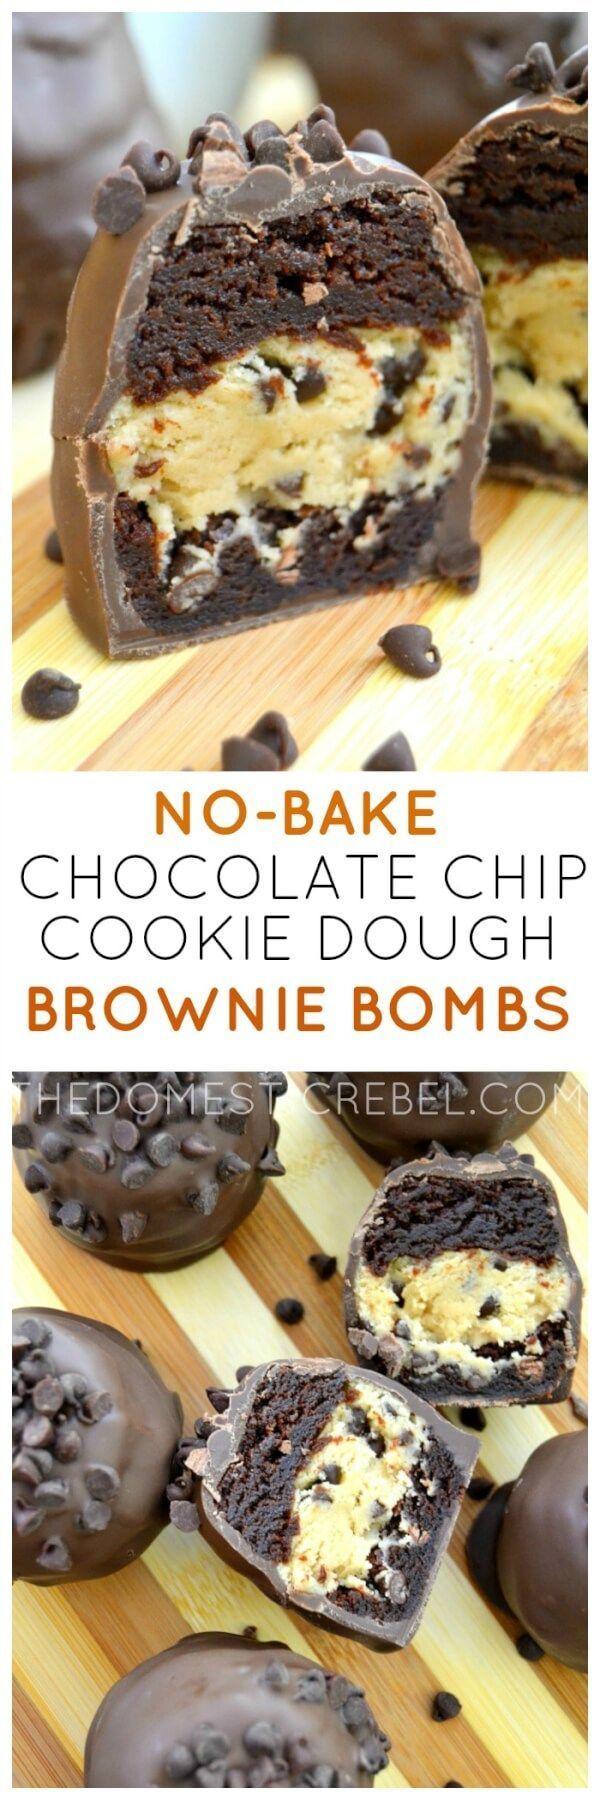 No-Bake Chocolate Chip Cookie Dough Brownie Bombs Recipe